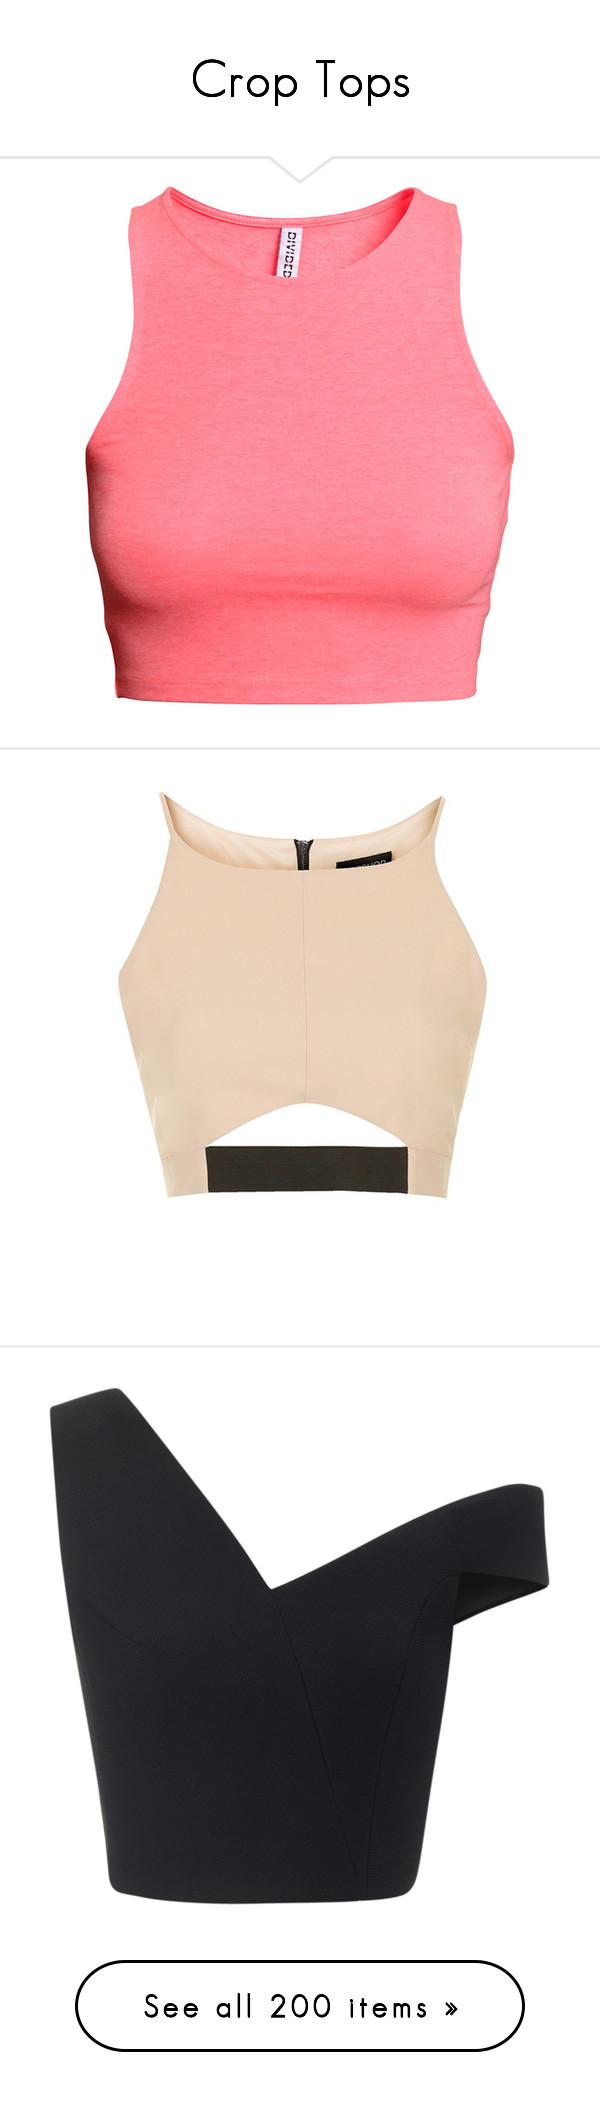 HARD WIRED Black Rubber Top Scuba Shirt Neoprene Neon